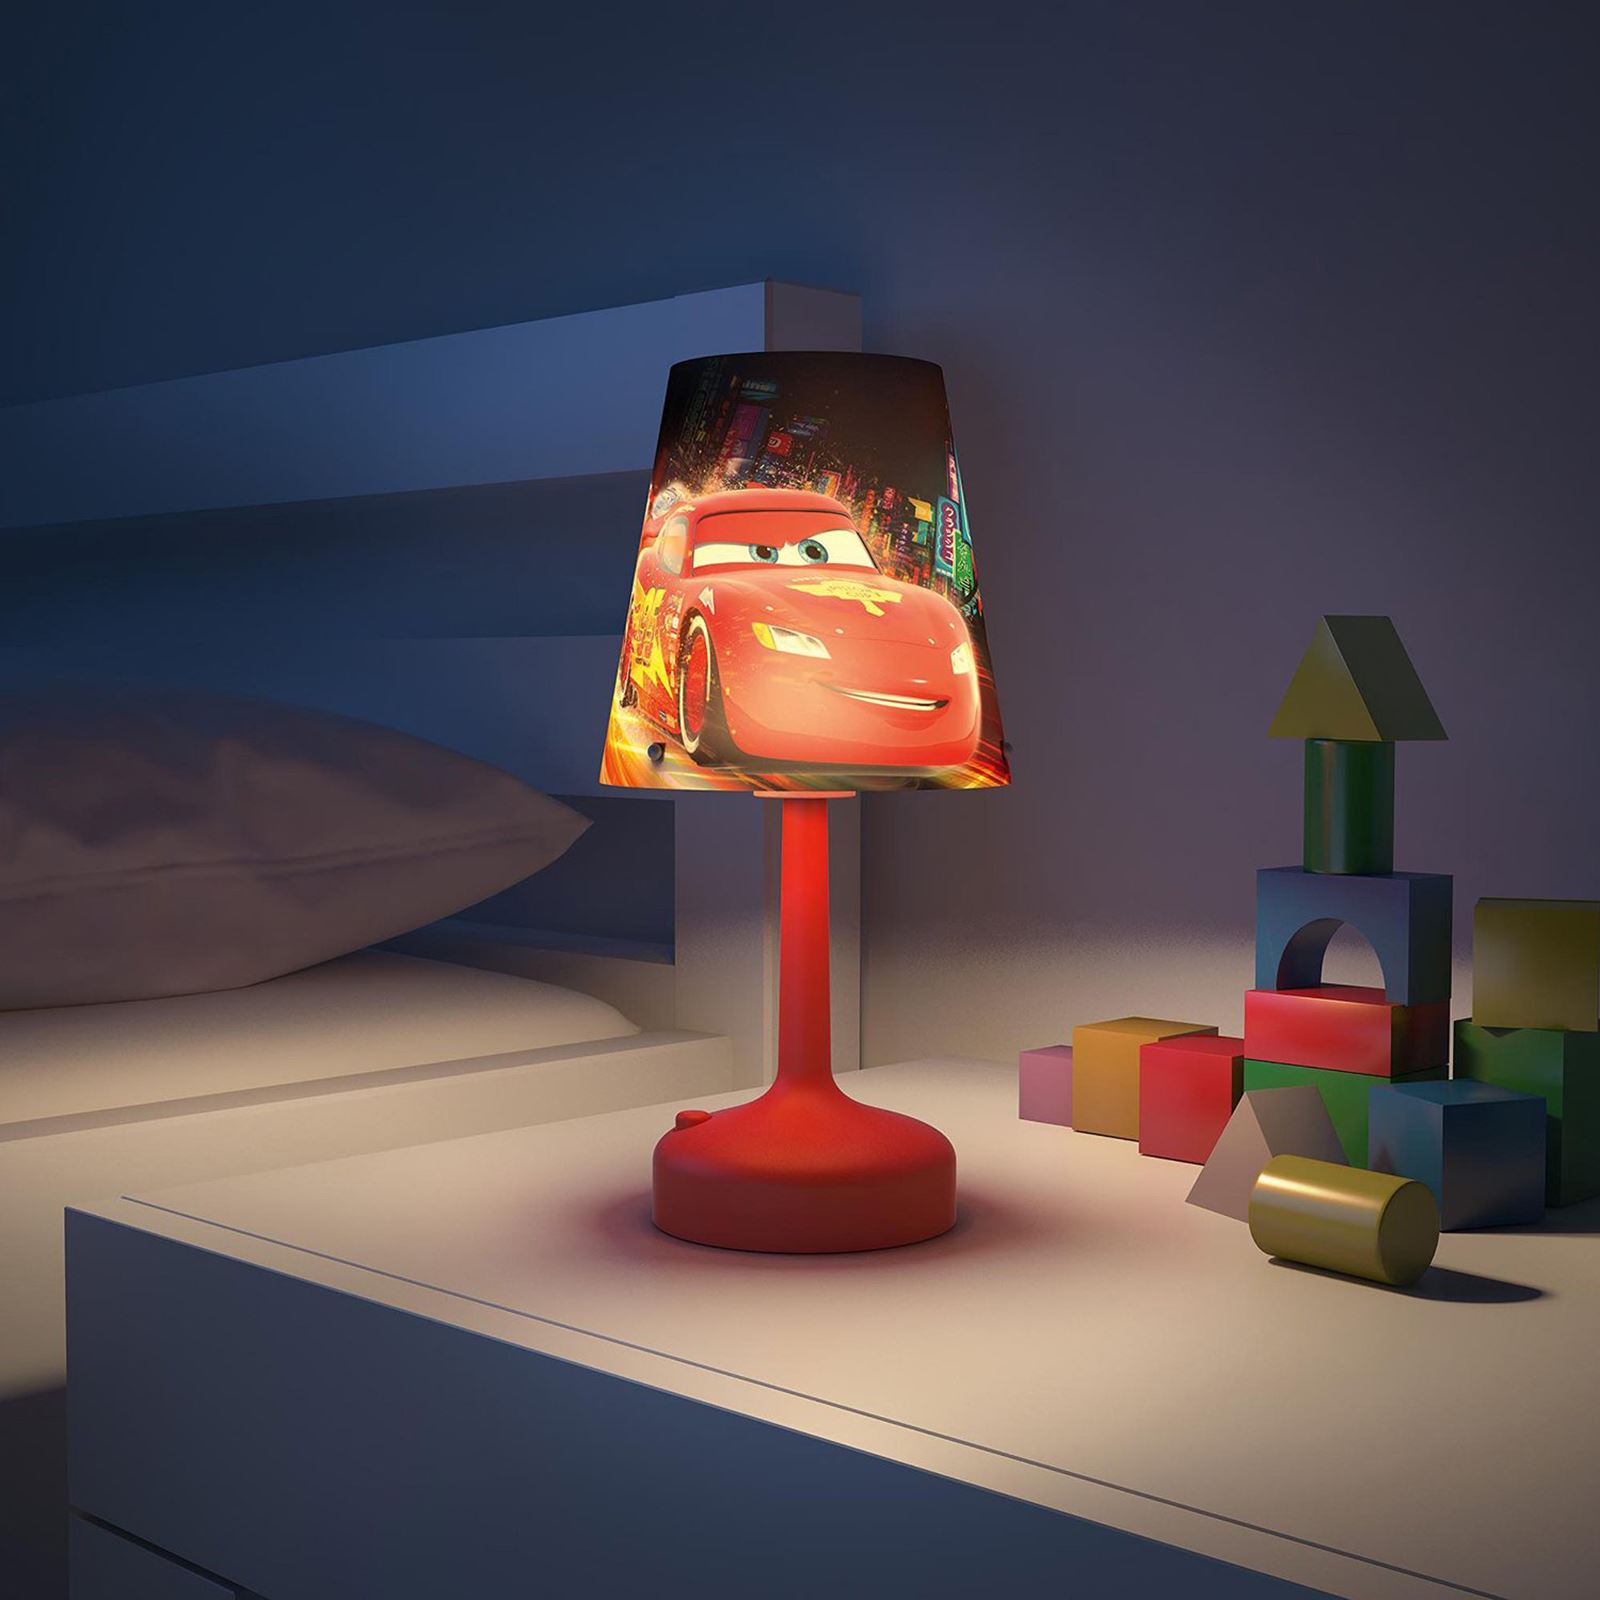 Disney Table Lamp : Disney cars red portable table lamp kids black bedroom